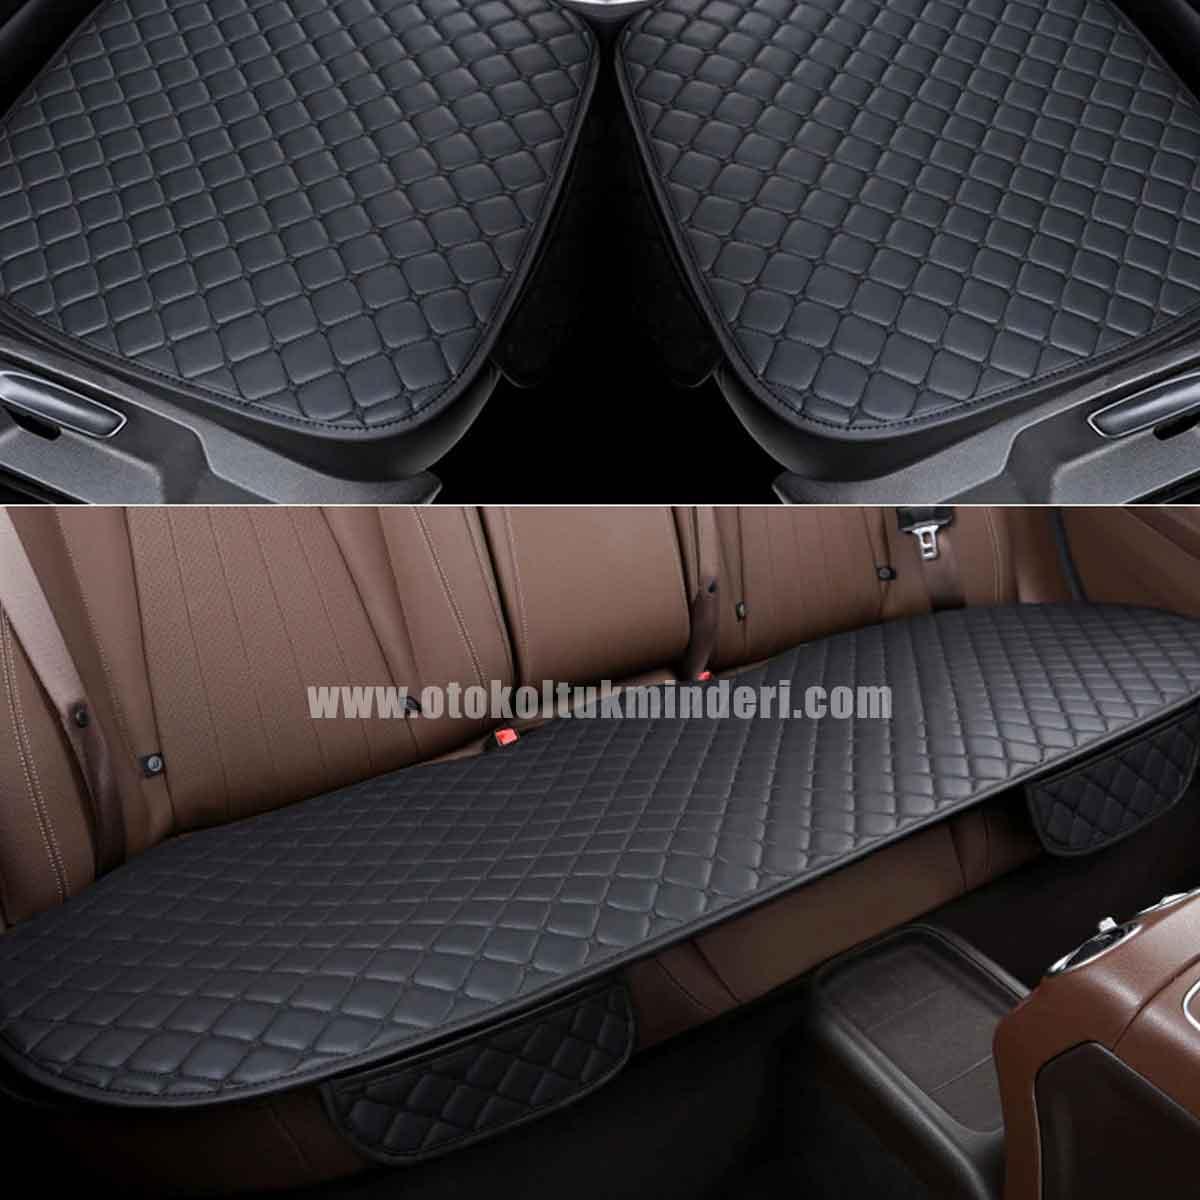 Chevrolet koltuk kılıfı deri - Chevrolet Koltuk minderi Siyah Deri Cepli